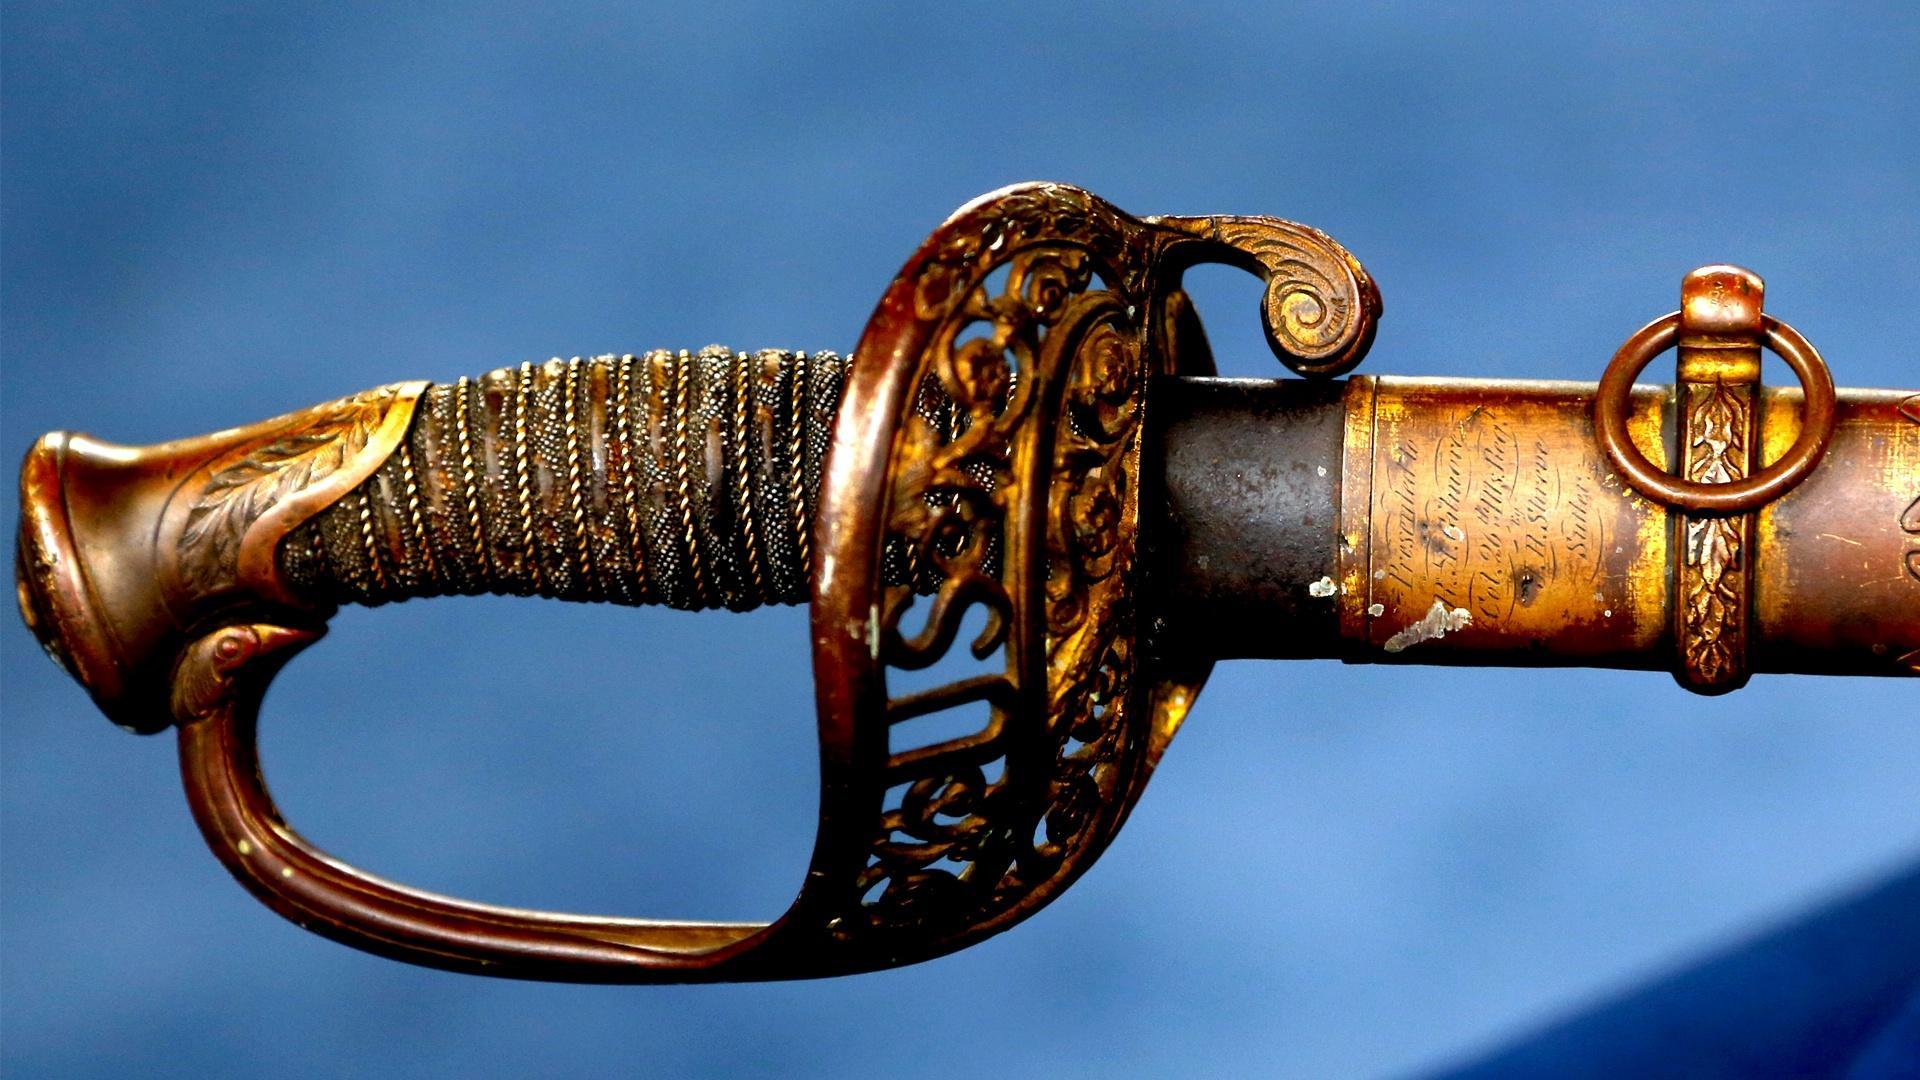 Appraisal: 1864 Civil War Officer's Sword